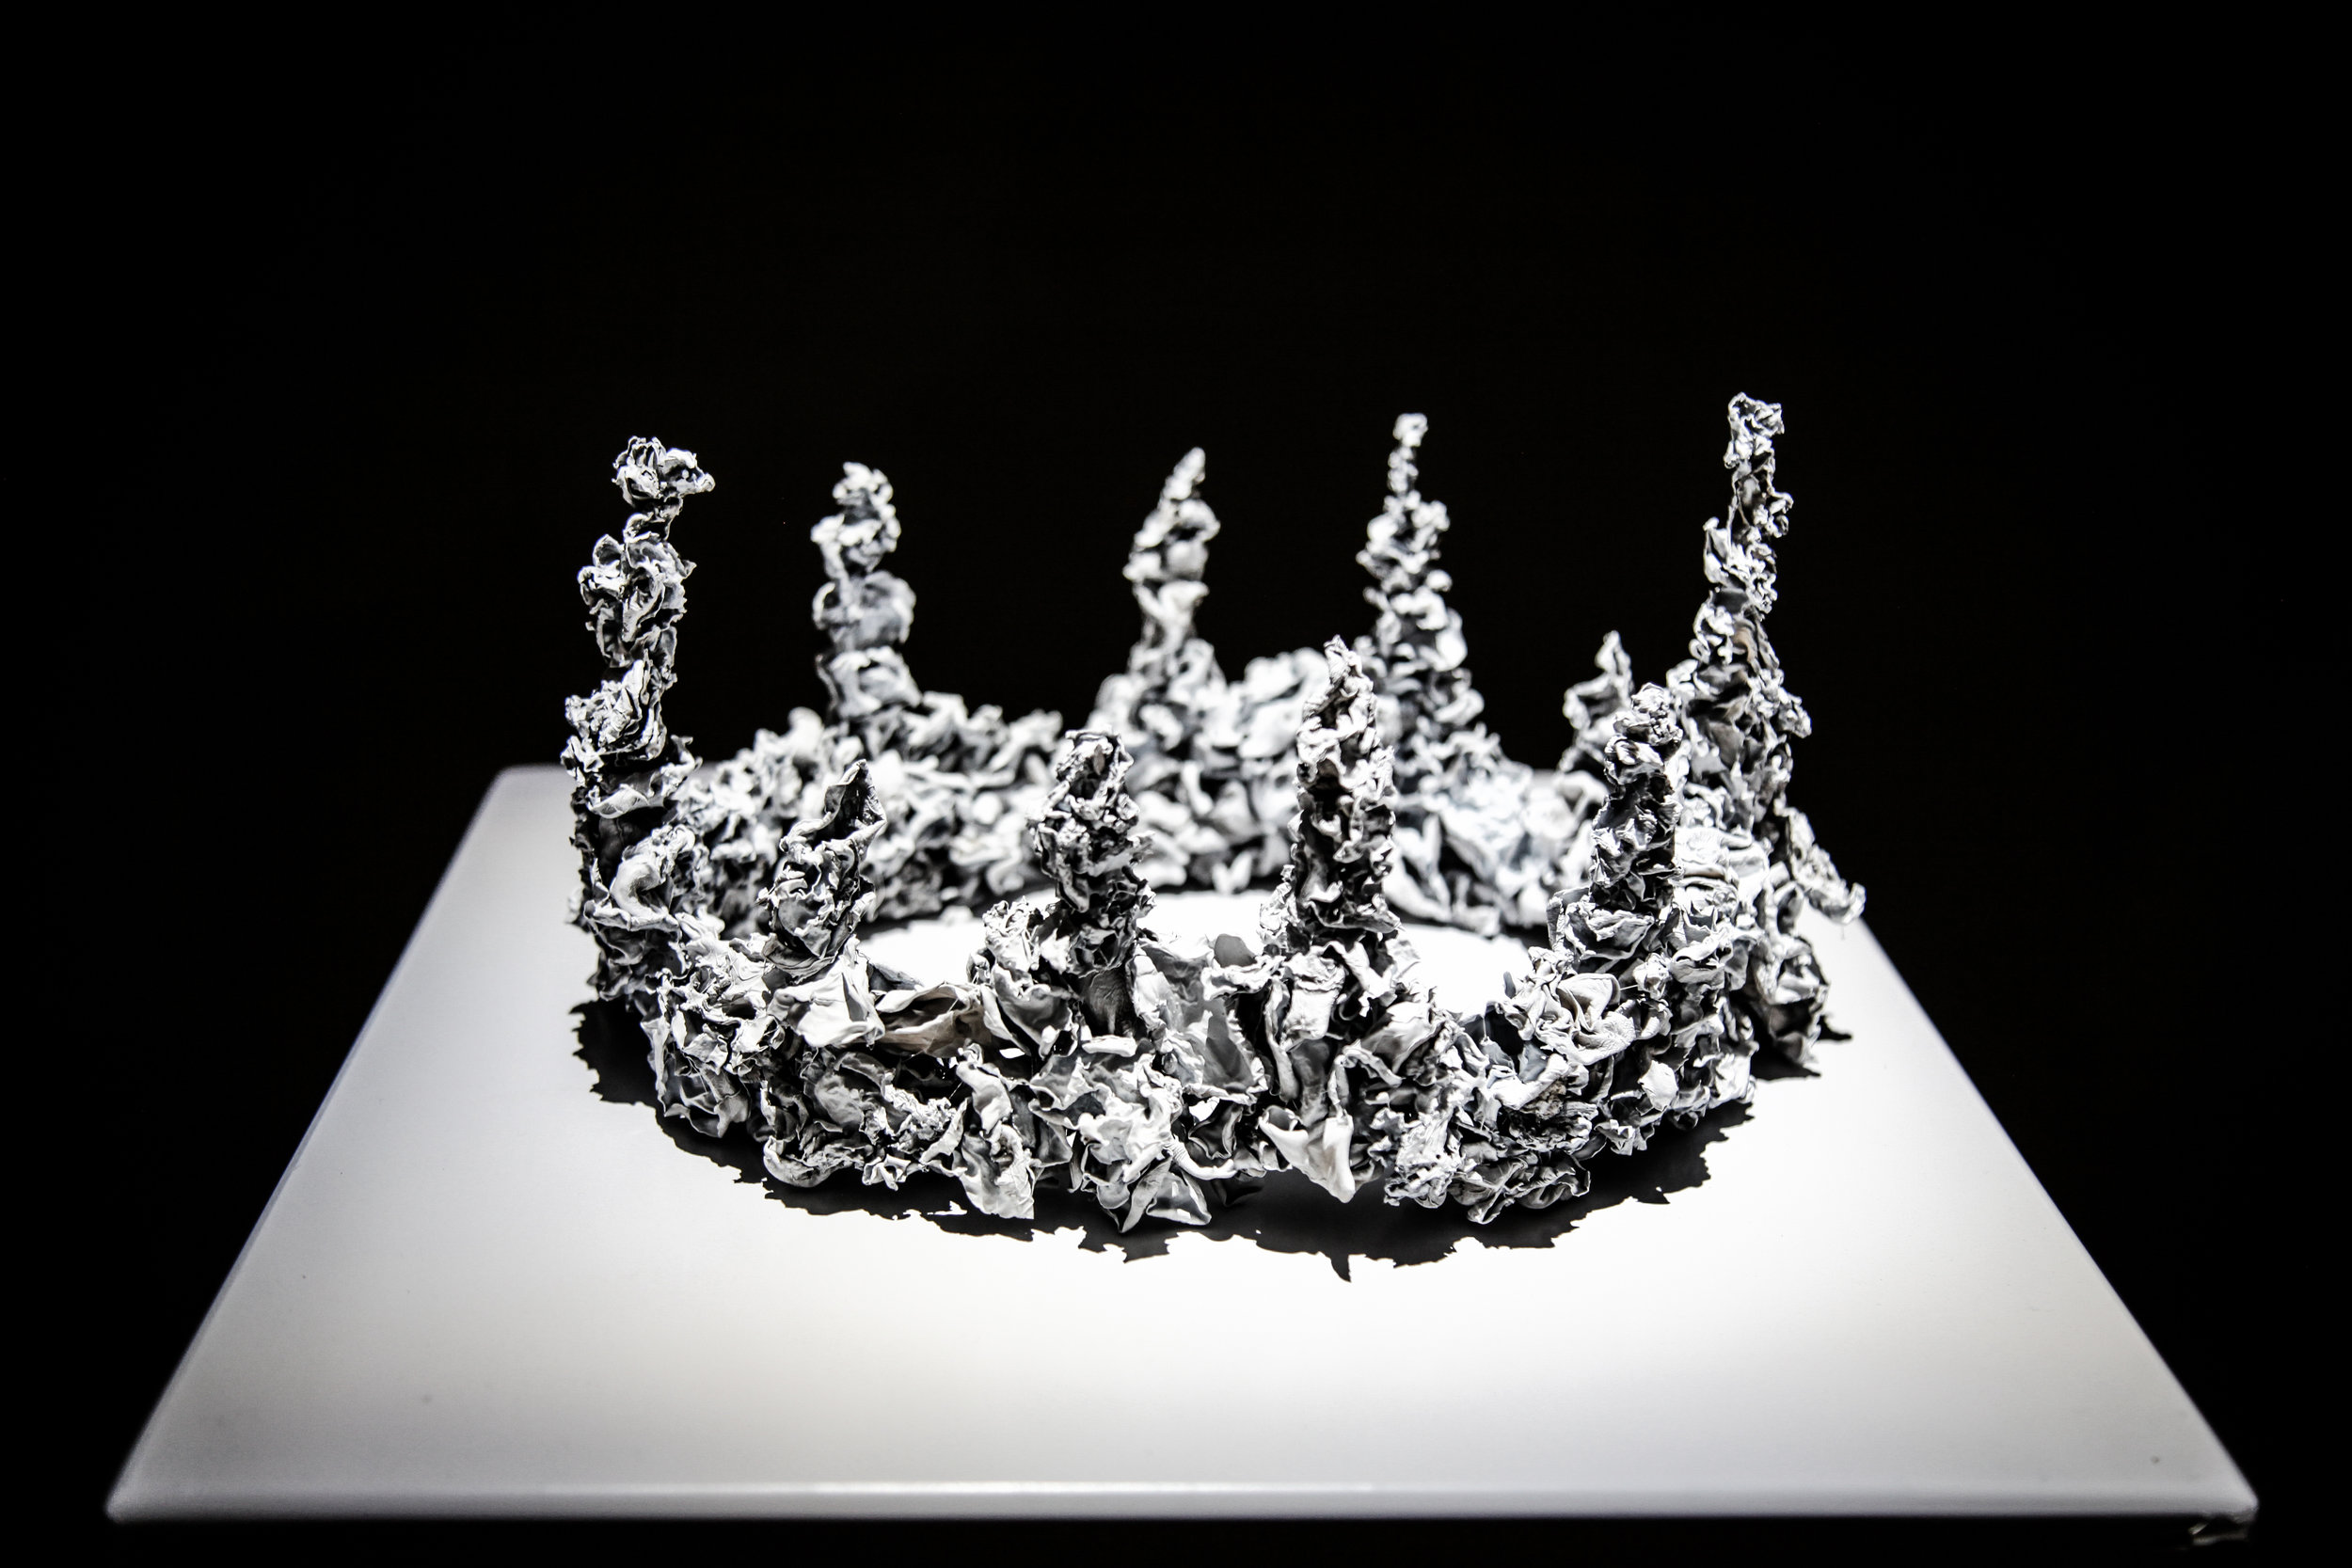 The14thFactory_HongKong_SimonBirch_GoriaYu_NathalyCharria_ArtSlant_Crowns.jpg